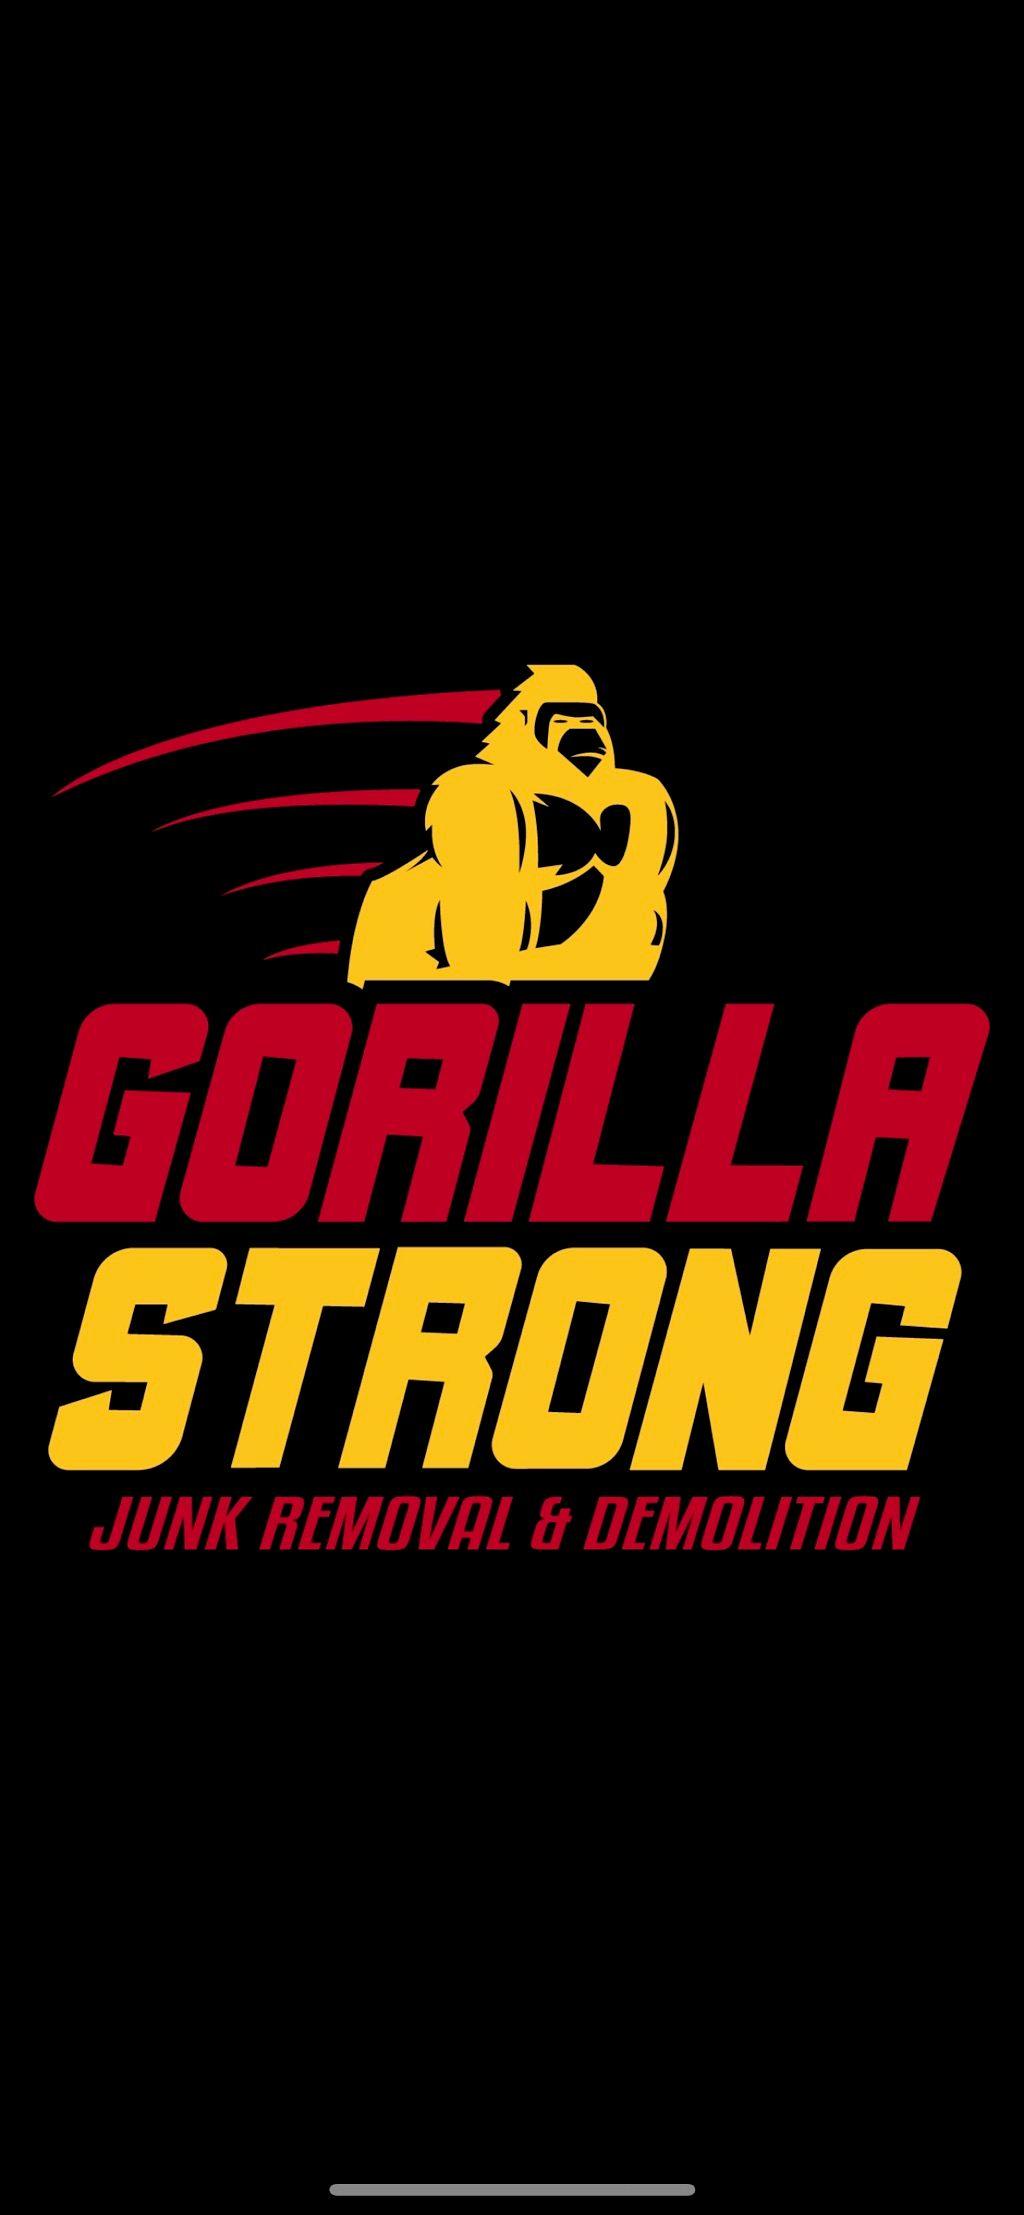 Gorilla Strong Junk Removal & Demolition LLC